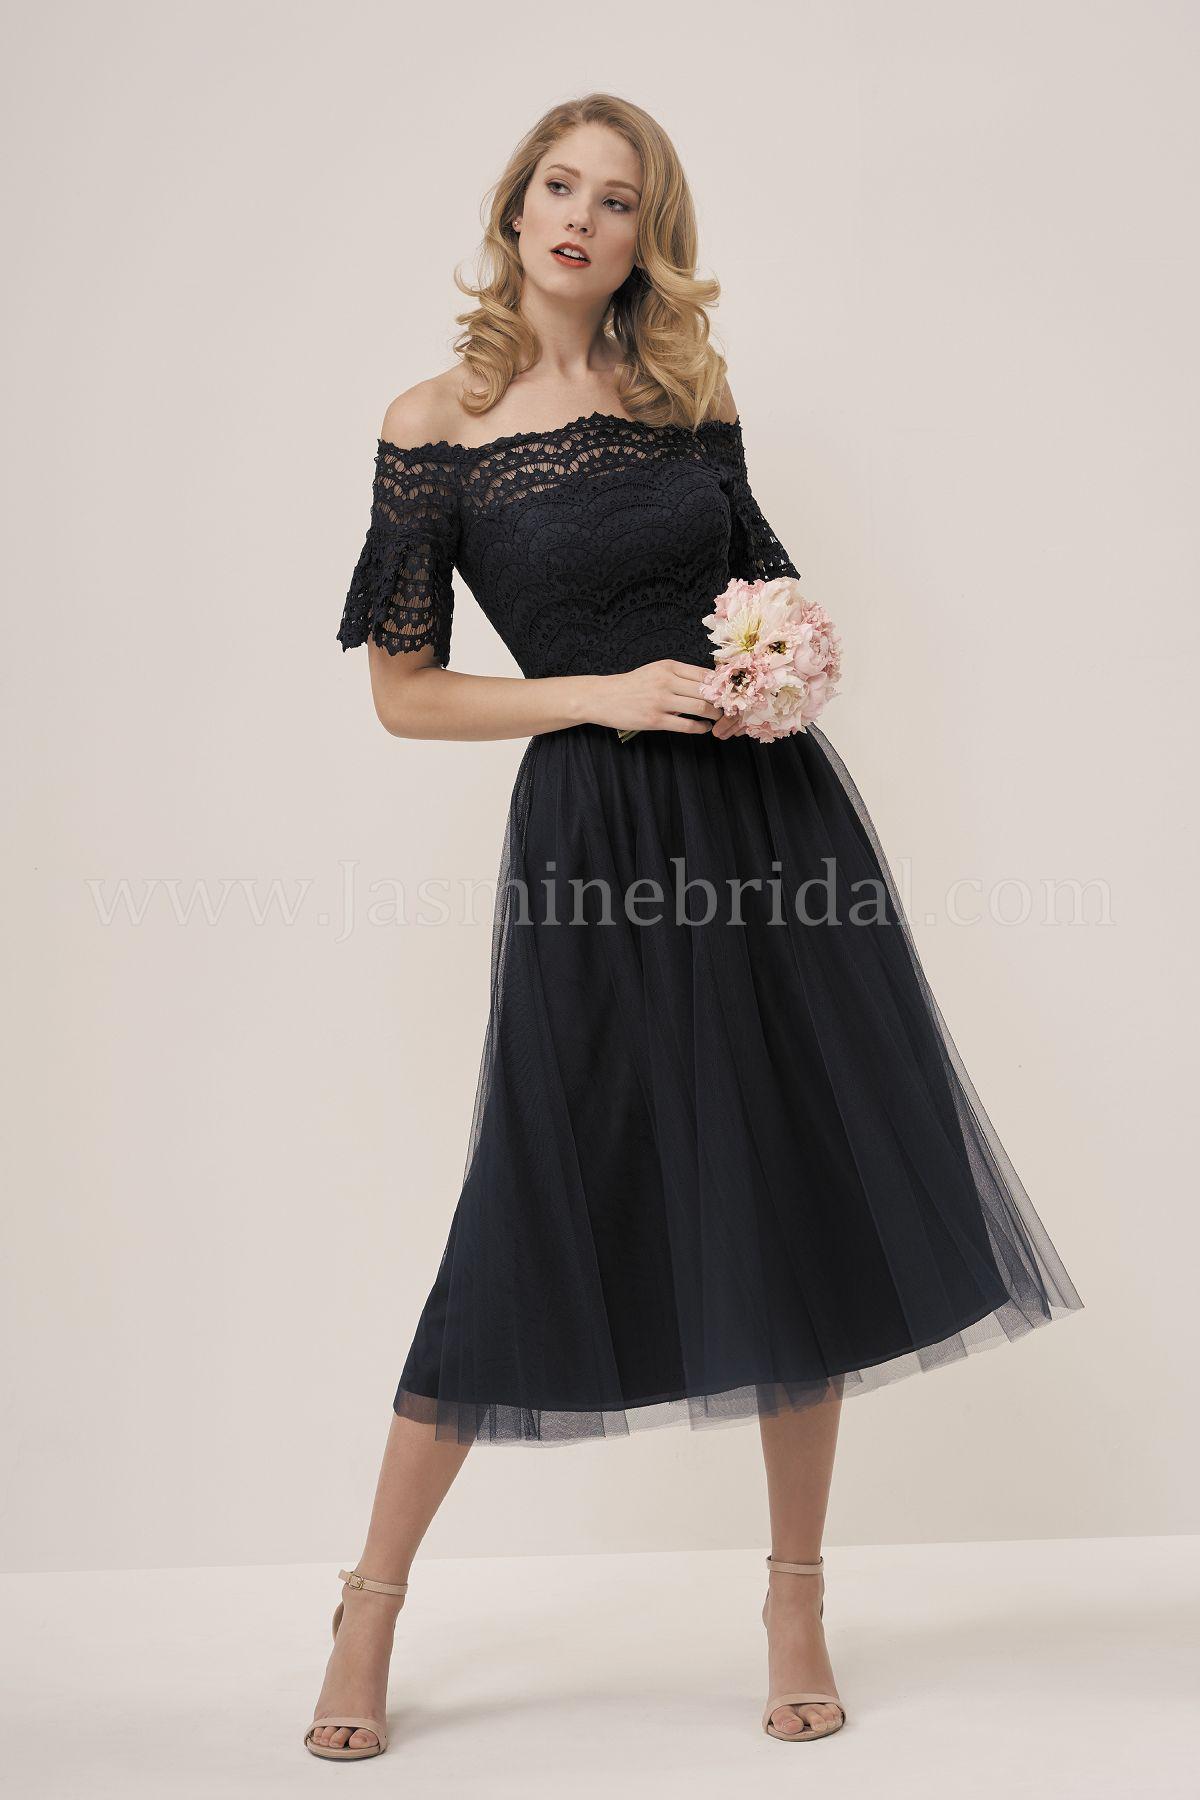 bridesmaid-dresses-P196061K-1